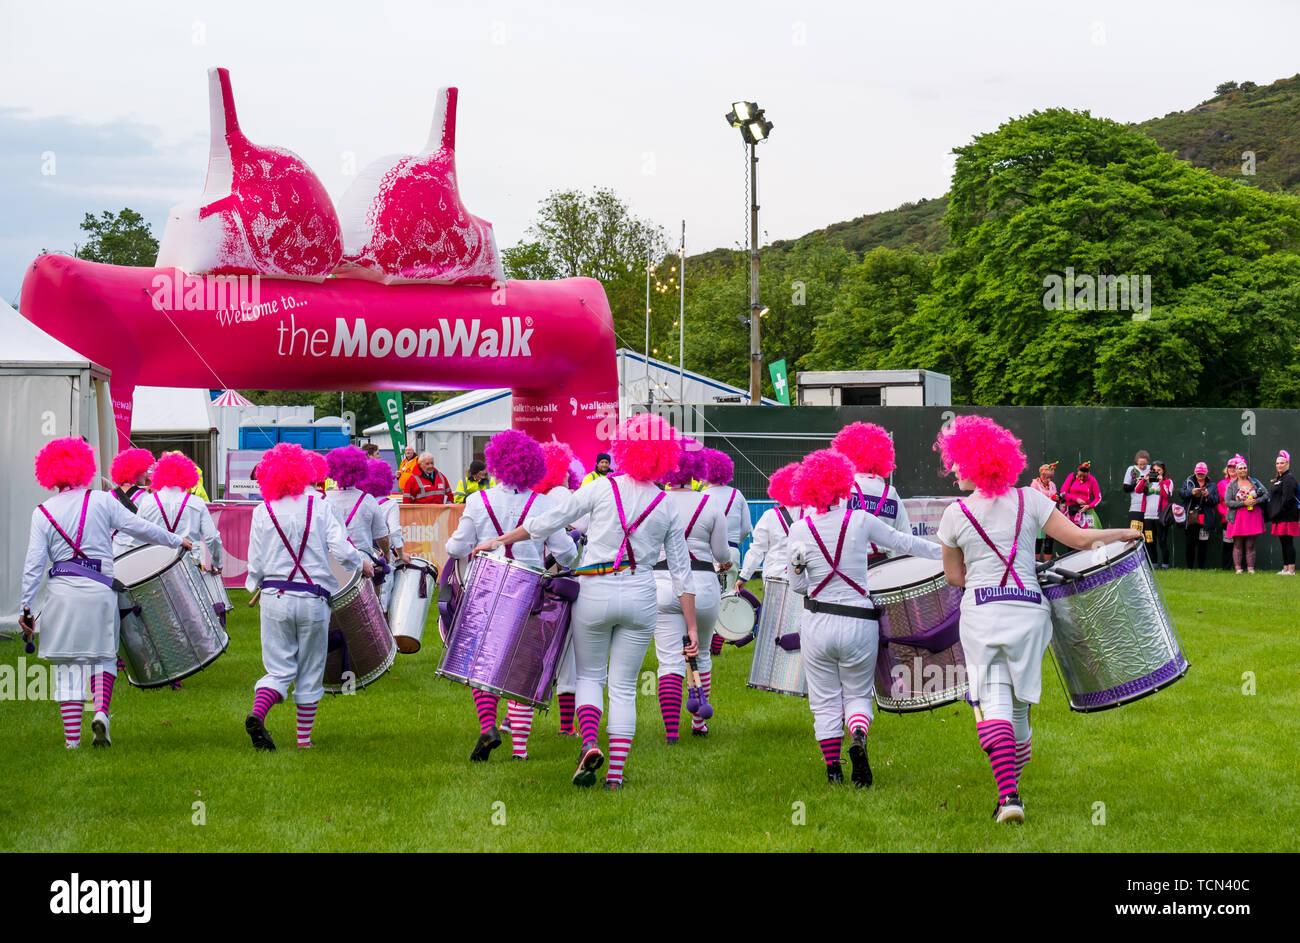 Edinburgh, Scotland, UK. 8th June 2019. Moonwalk Scotland: The 14th Moonwalk Scotland 'Walk the Walk' night-time event. Edinburgh all women Samba drumming band Commotion dressed as clowns Stock Photo